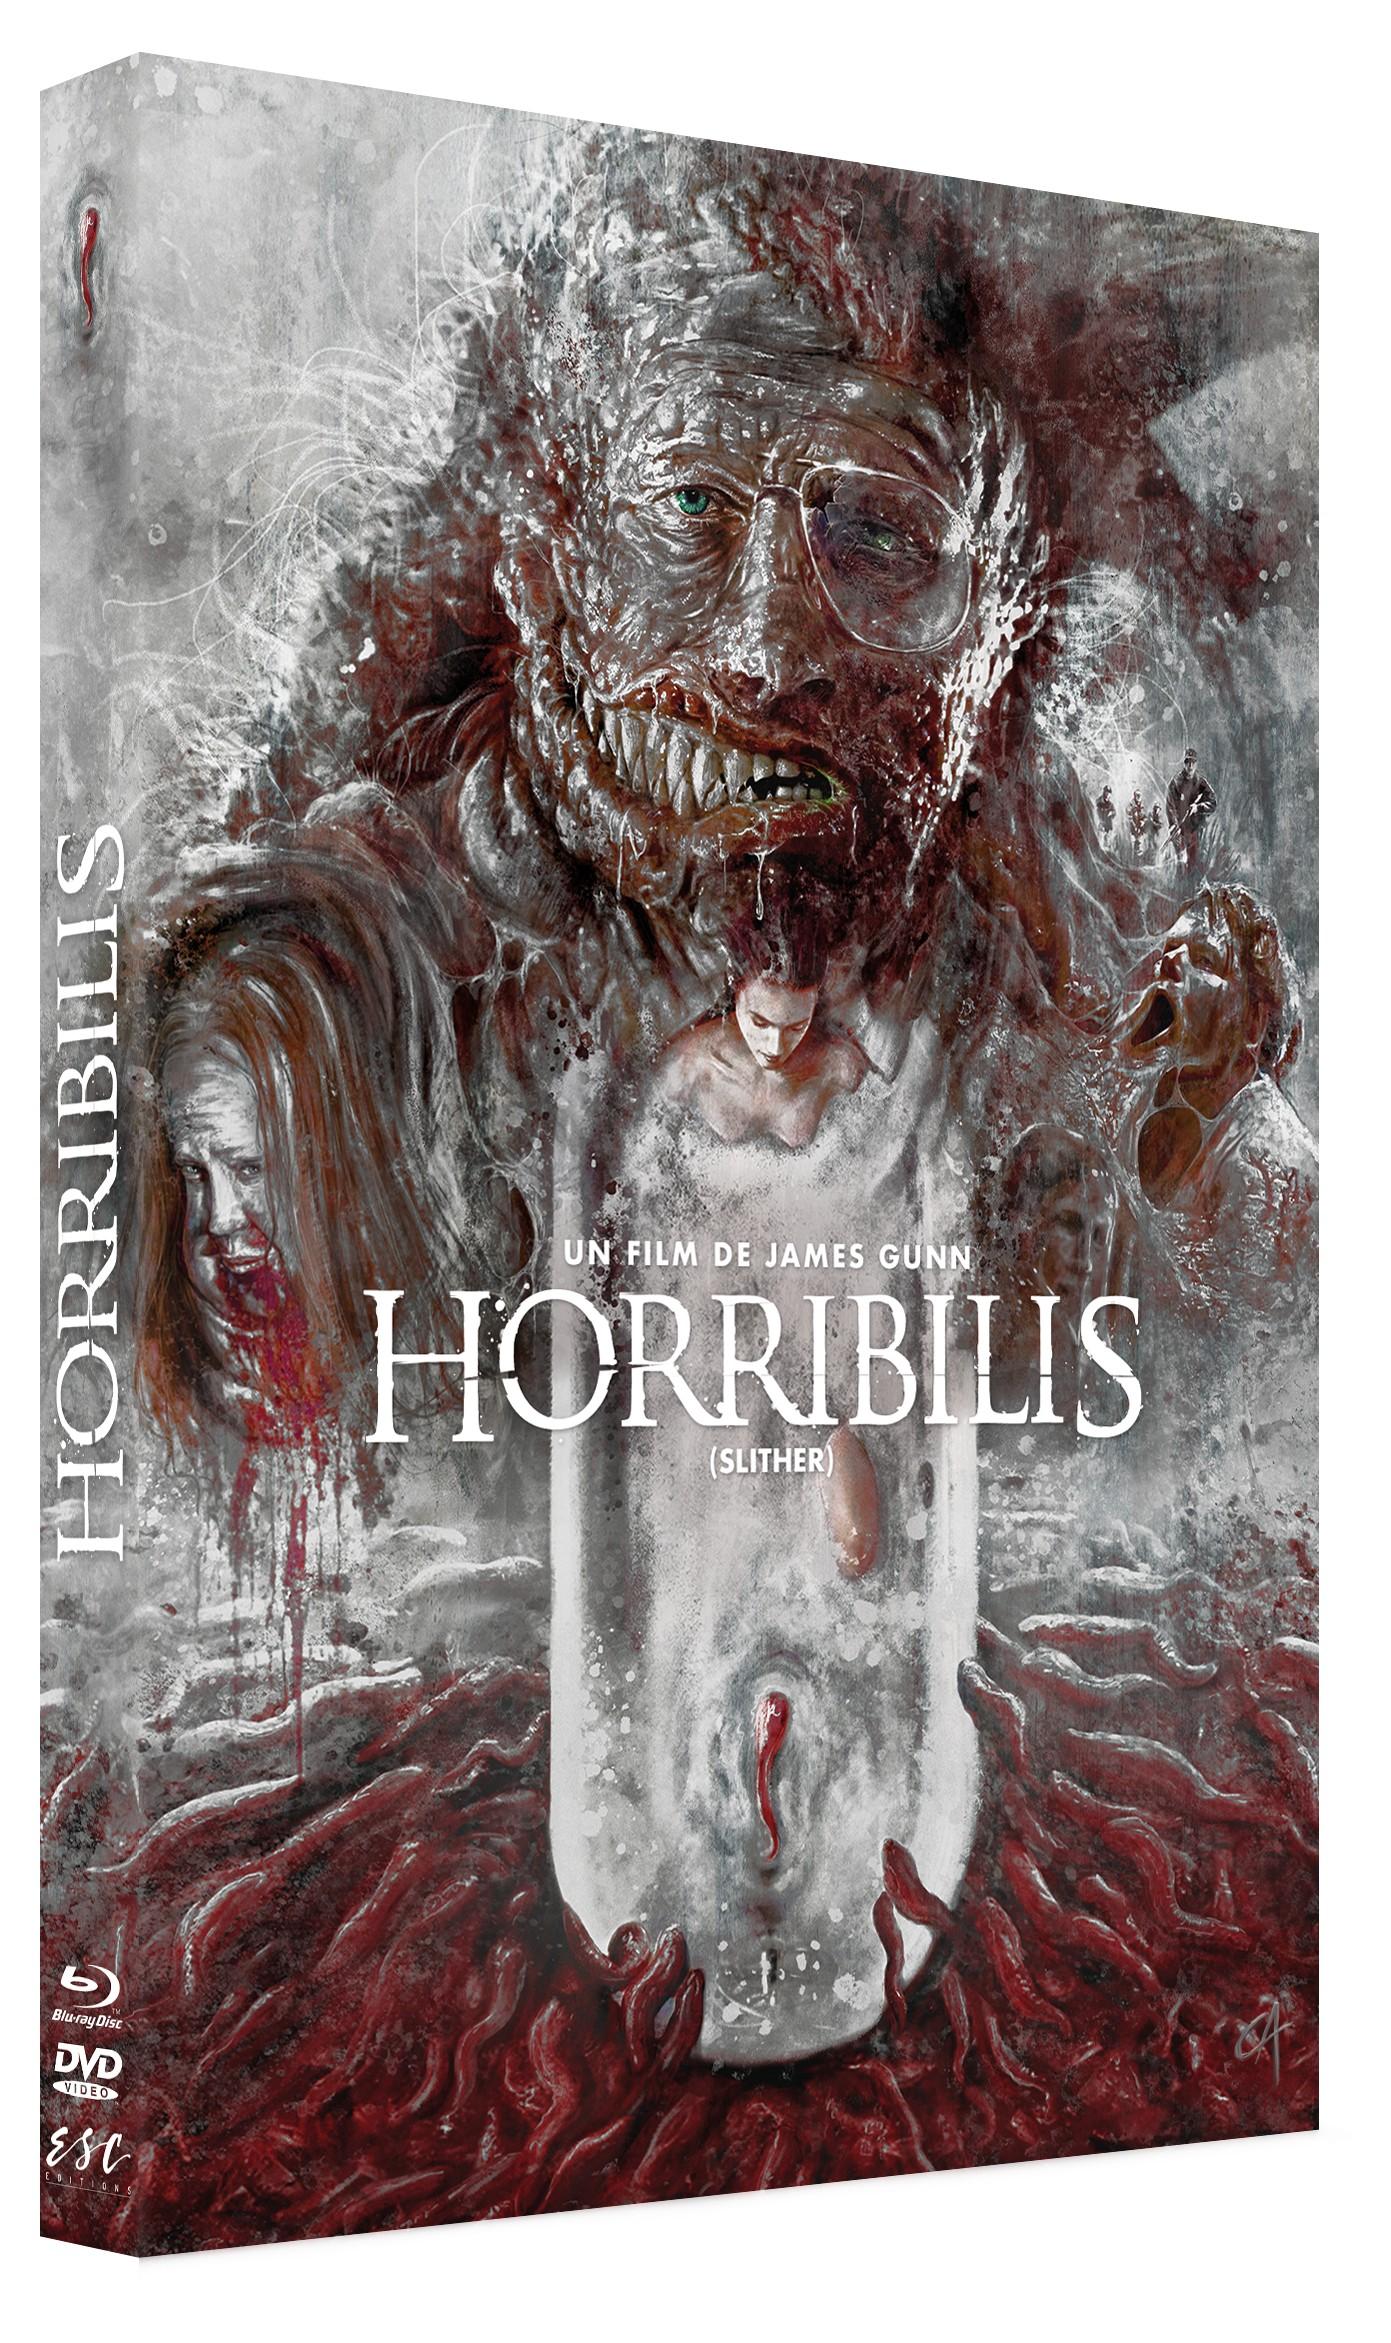 HORRIBILIS (SILTHER) - EDITION COLLECTOR LIMITÉE